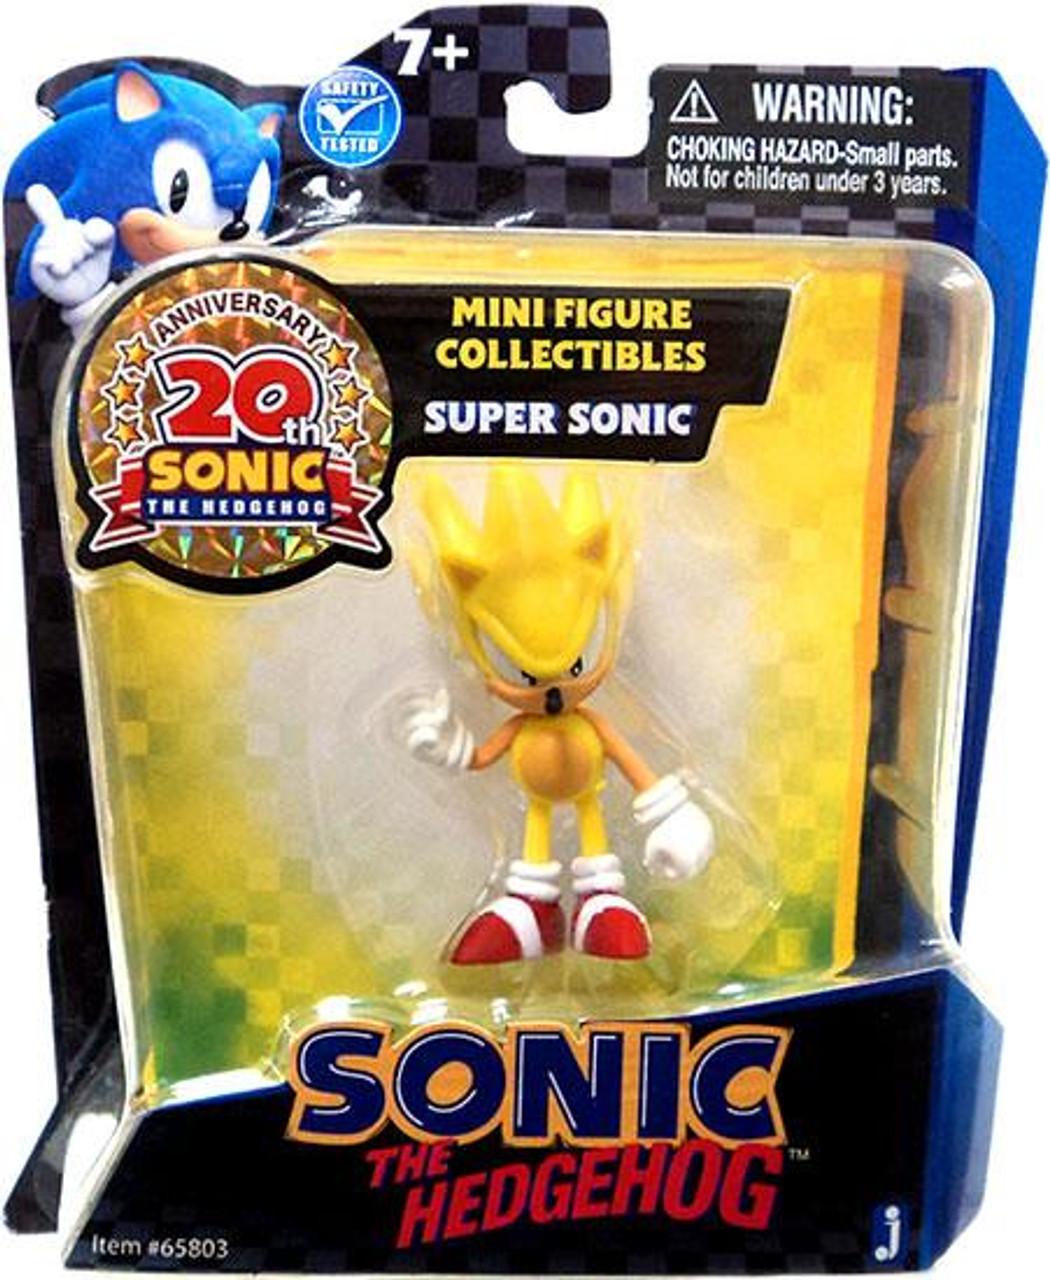 Sonic The Hedgehog 20th Anniversary Super Sonic Mini Figure [Yellow]